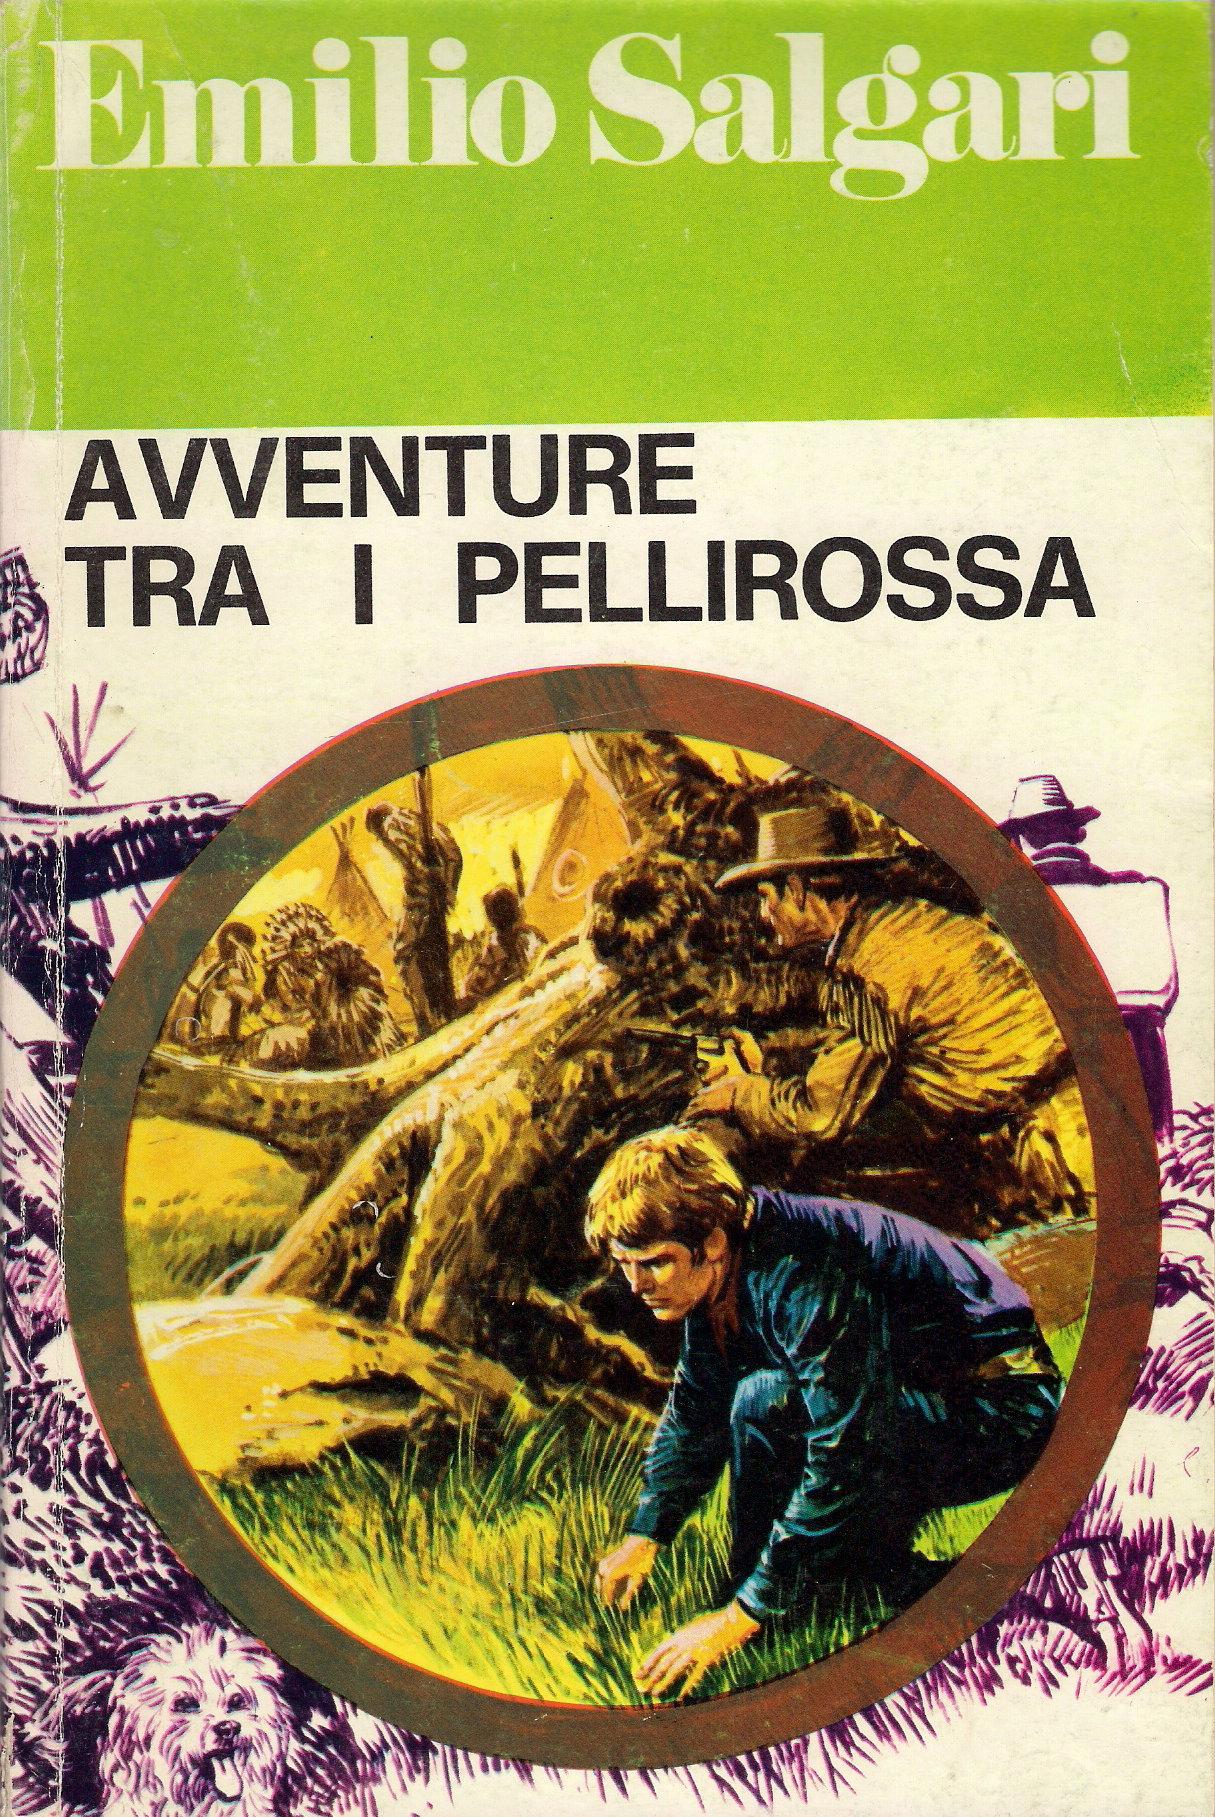 Avventure tra i pellirossa